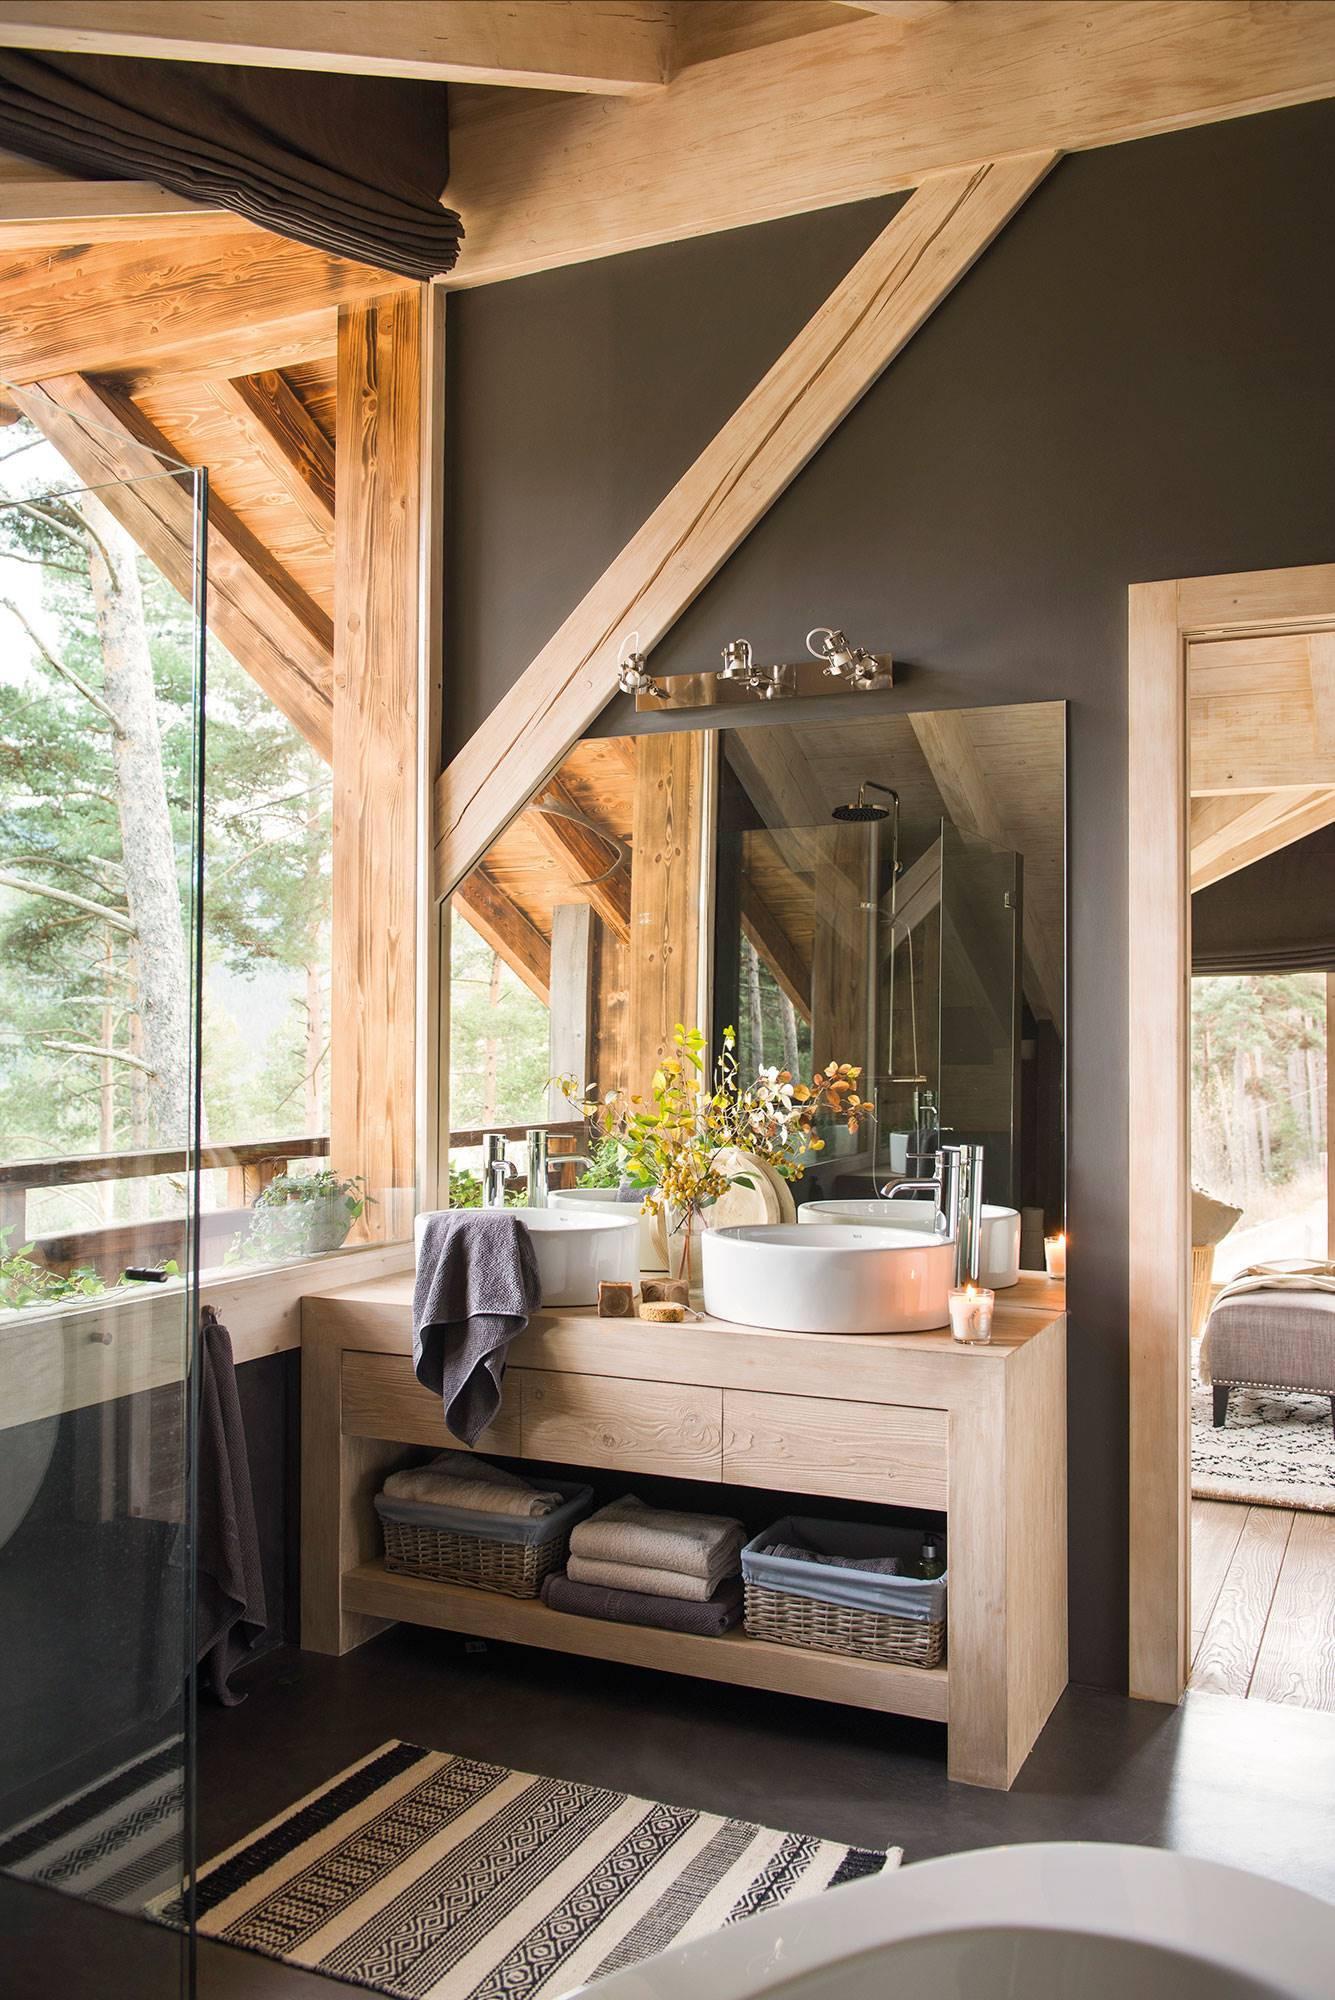 Trucos para tener un baño mas acogedor - la luz natural a tu favor